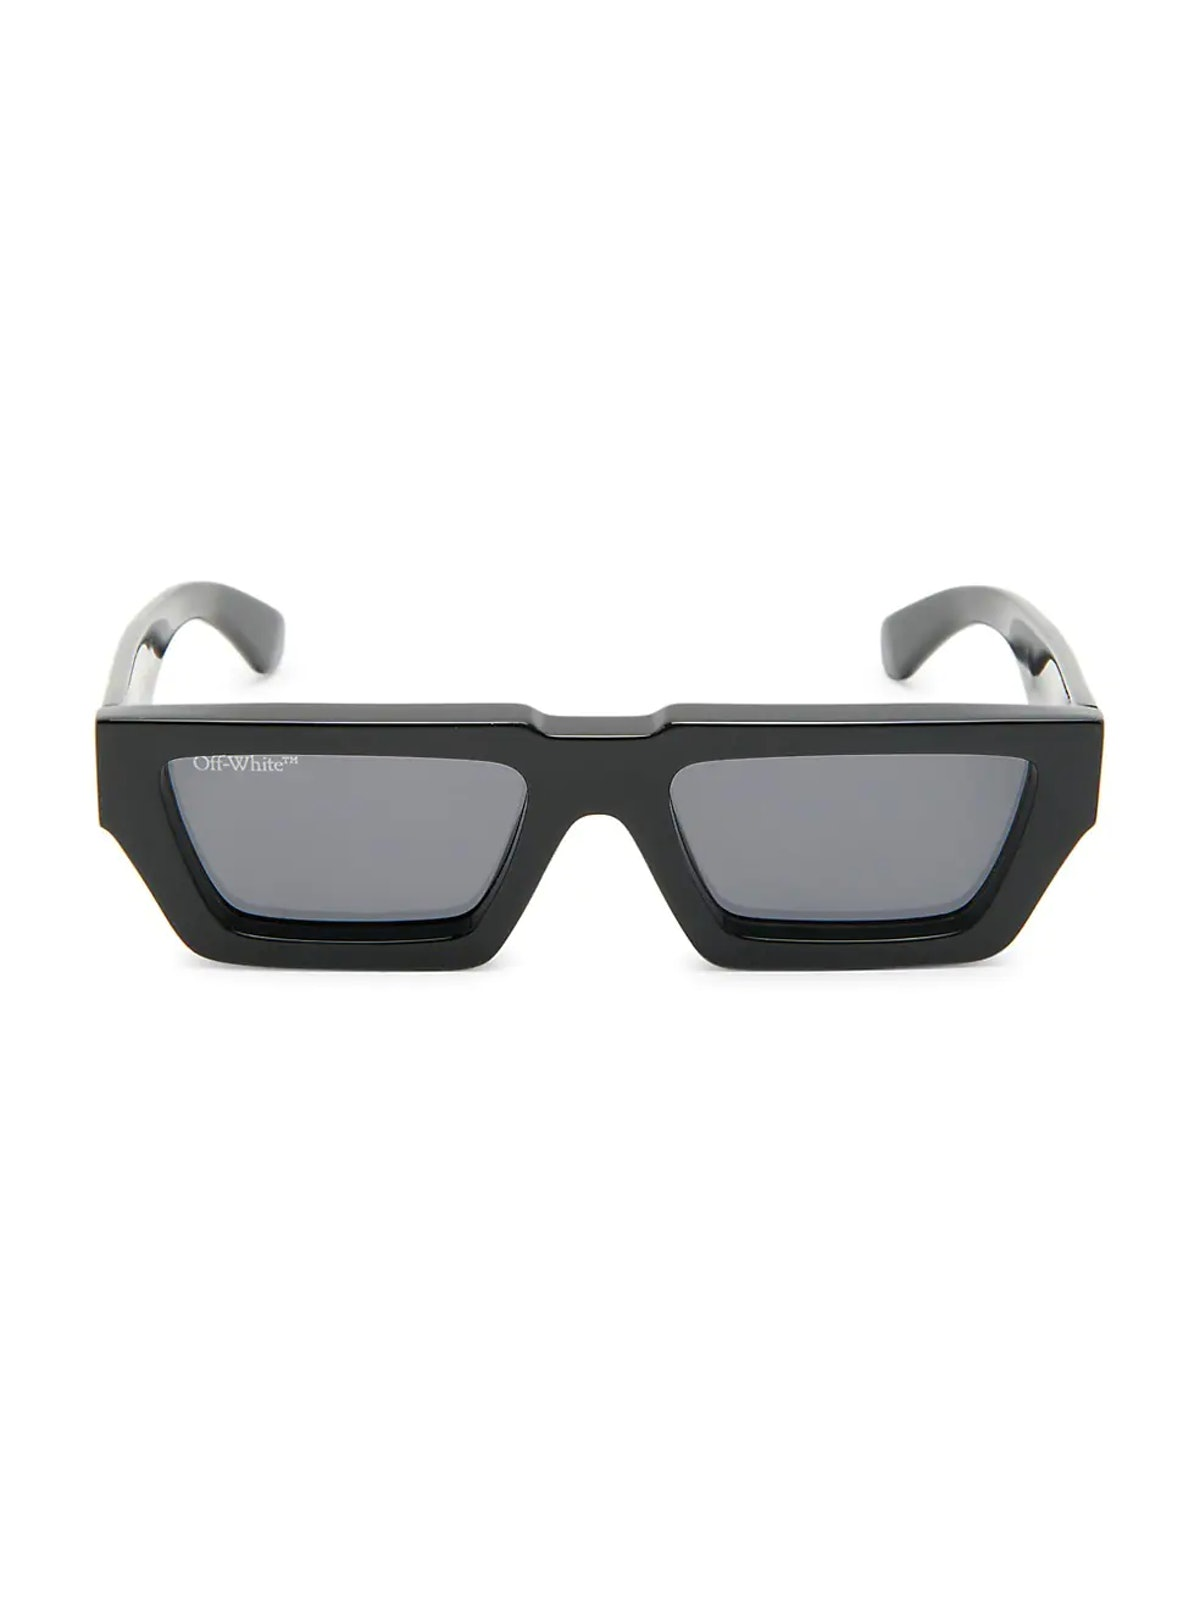 Manchester 54MM Rectangular Sunglasses from Off-White.